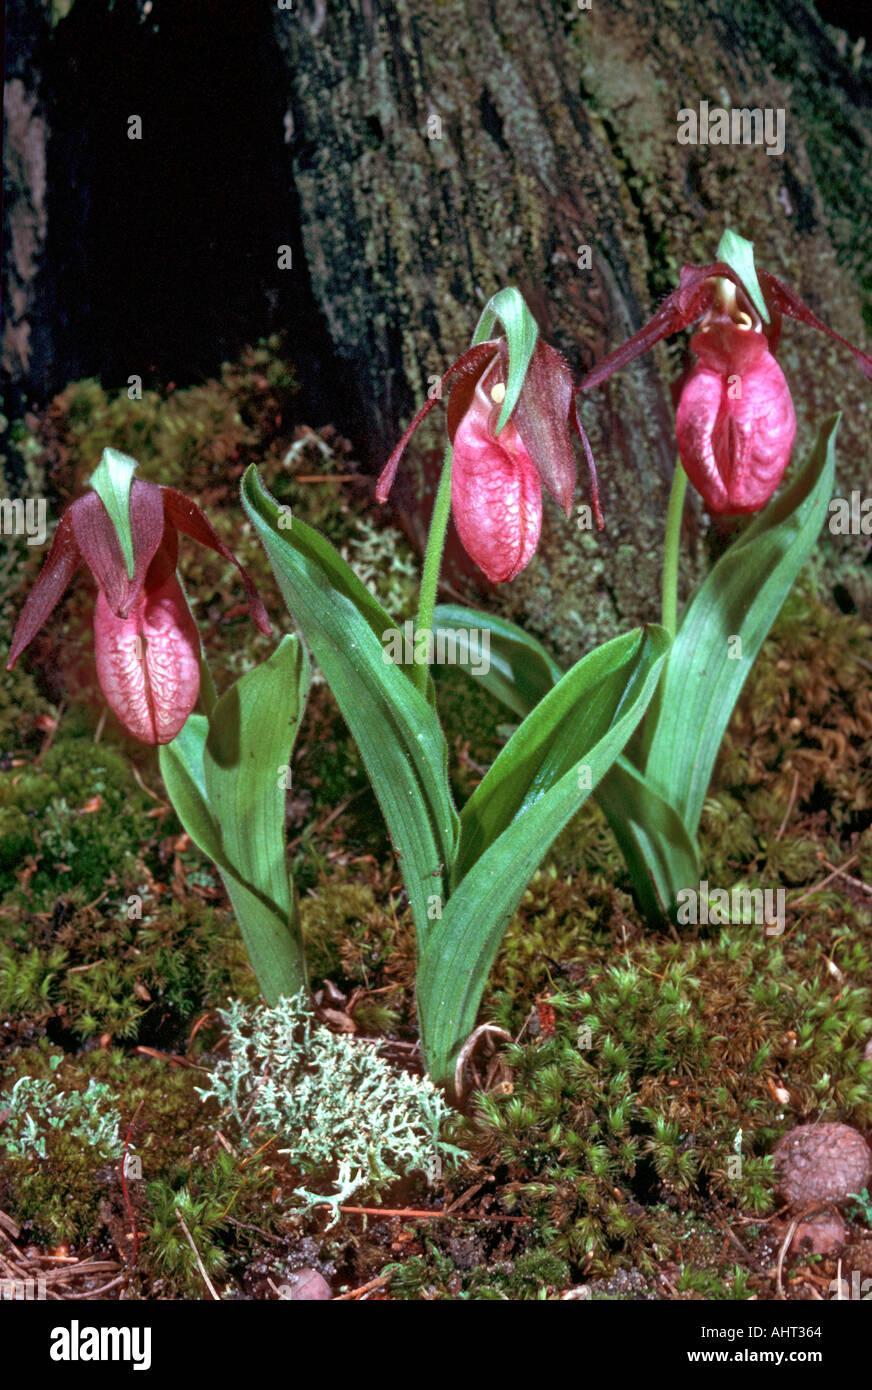 Michigan wild flower a trio of pink lady slippers stock photo michigan wild flower a trio of pink lady slippers mightylinksfo